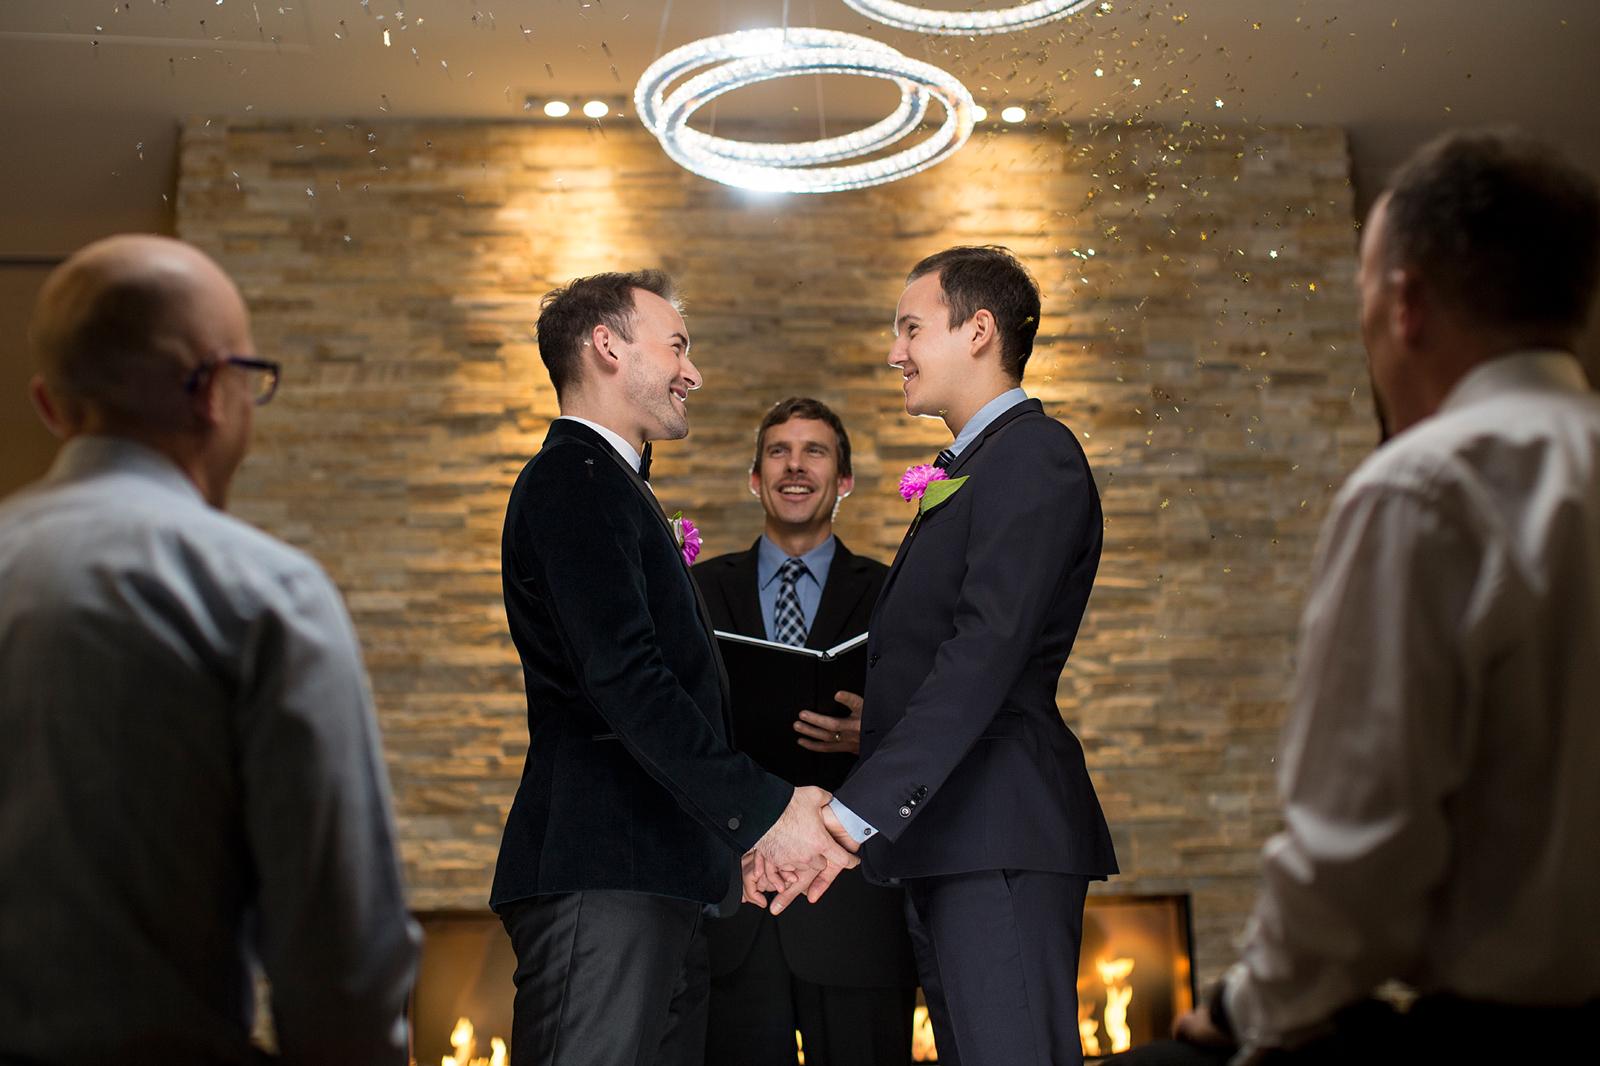 Bakery Won't Make Cake For Gay Wedding